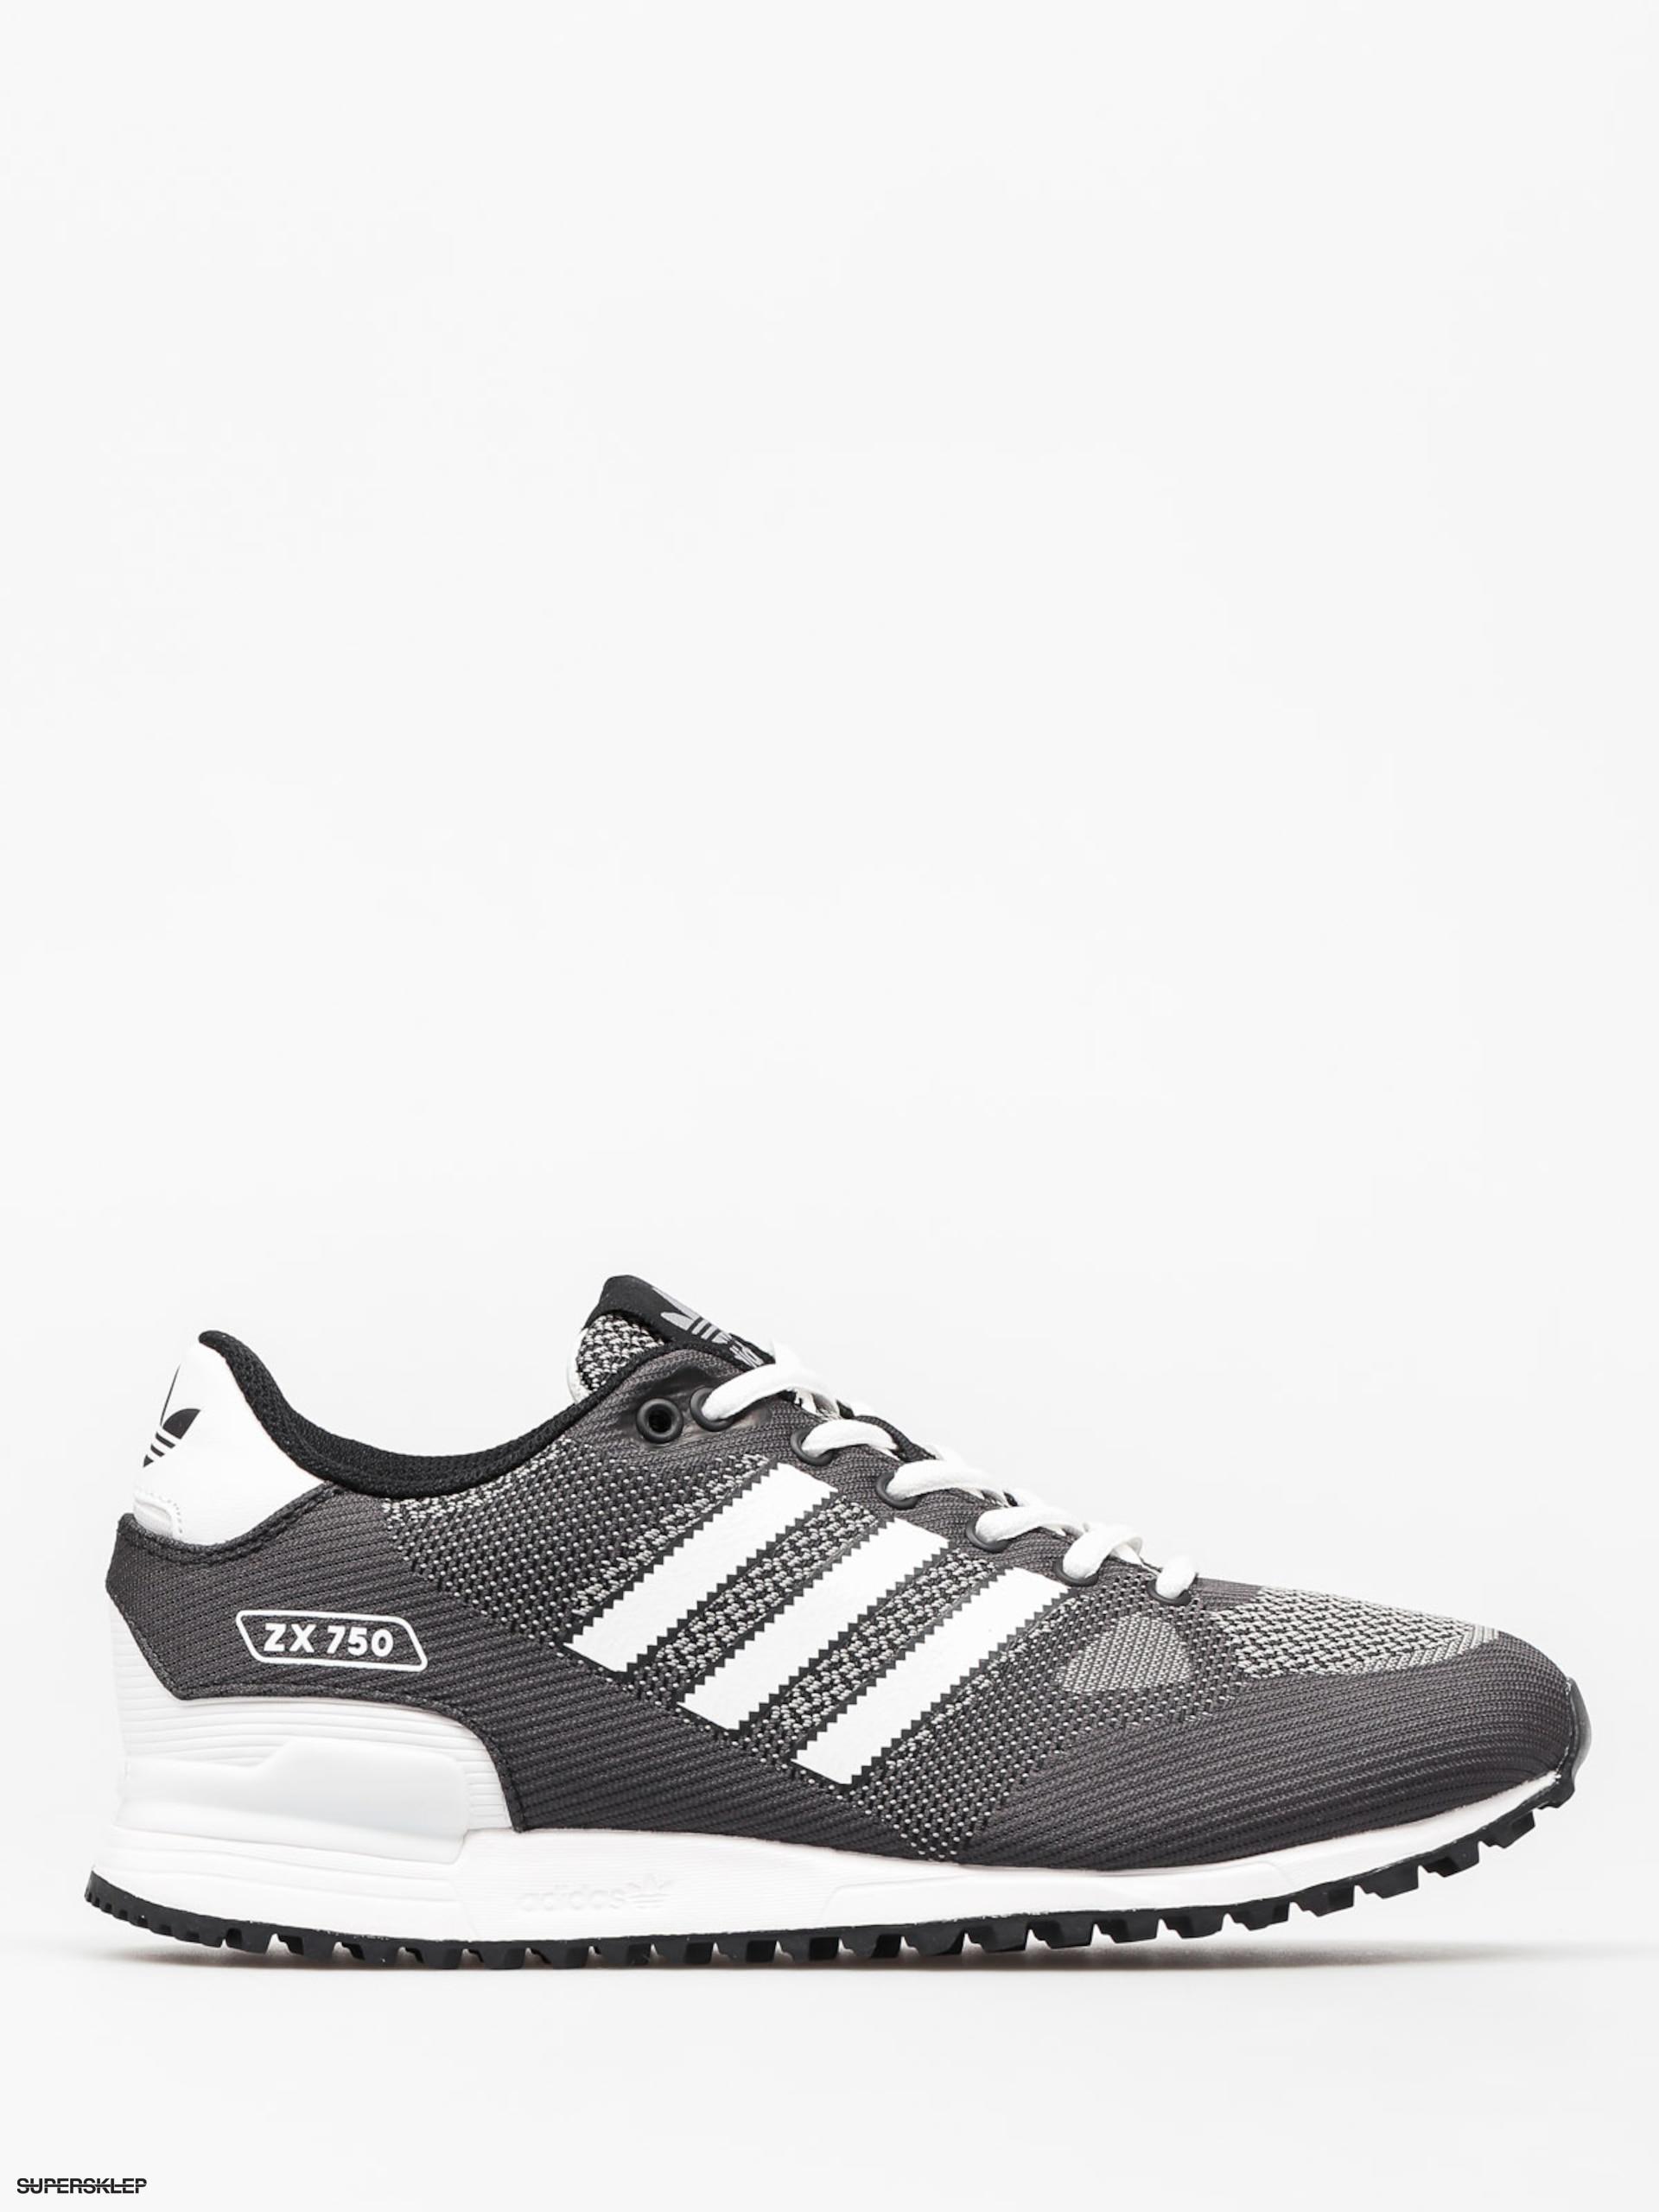 100% authentic 65f39 76244 ... uk buty adidas zx 750 wv cblack ftwwht utiblk 3c1b6 b0552